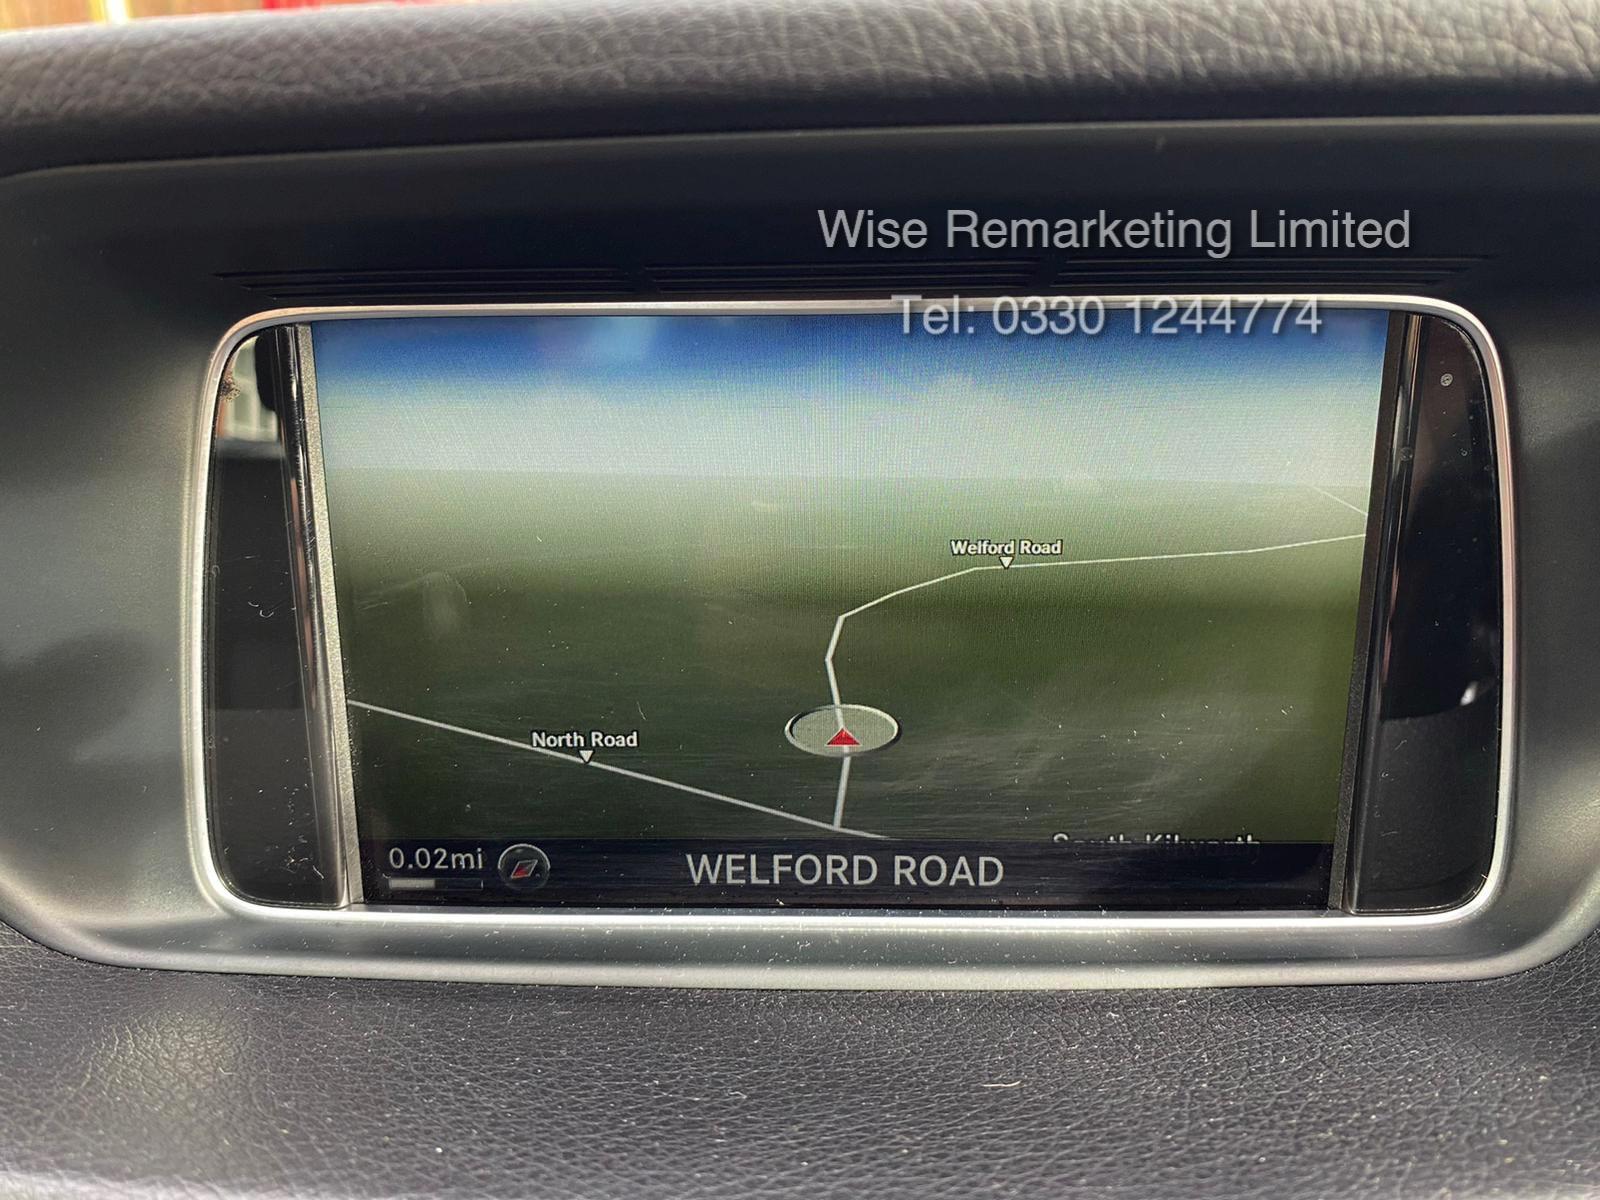 Mercedes E220d 2.1 Special Equipment Auto 2015 15 Reg - 1 Former Keeper - Sat Nav - Parking Sensors - Image 12 of 14